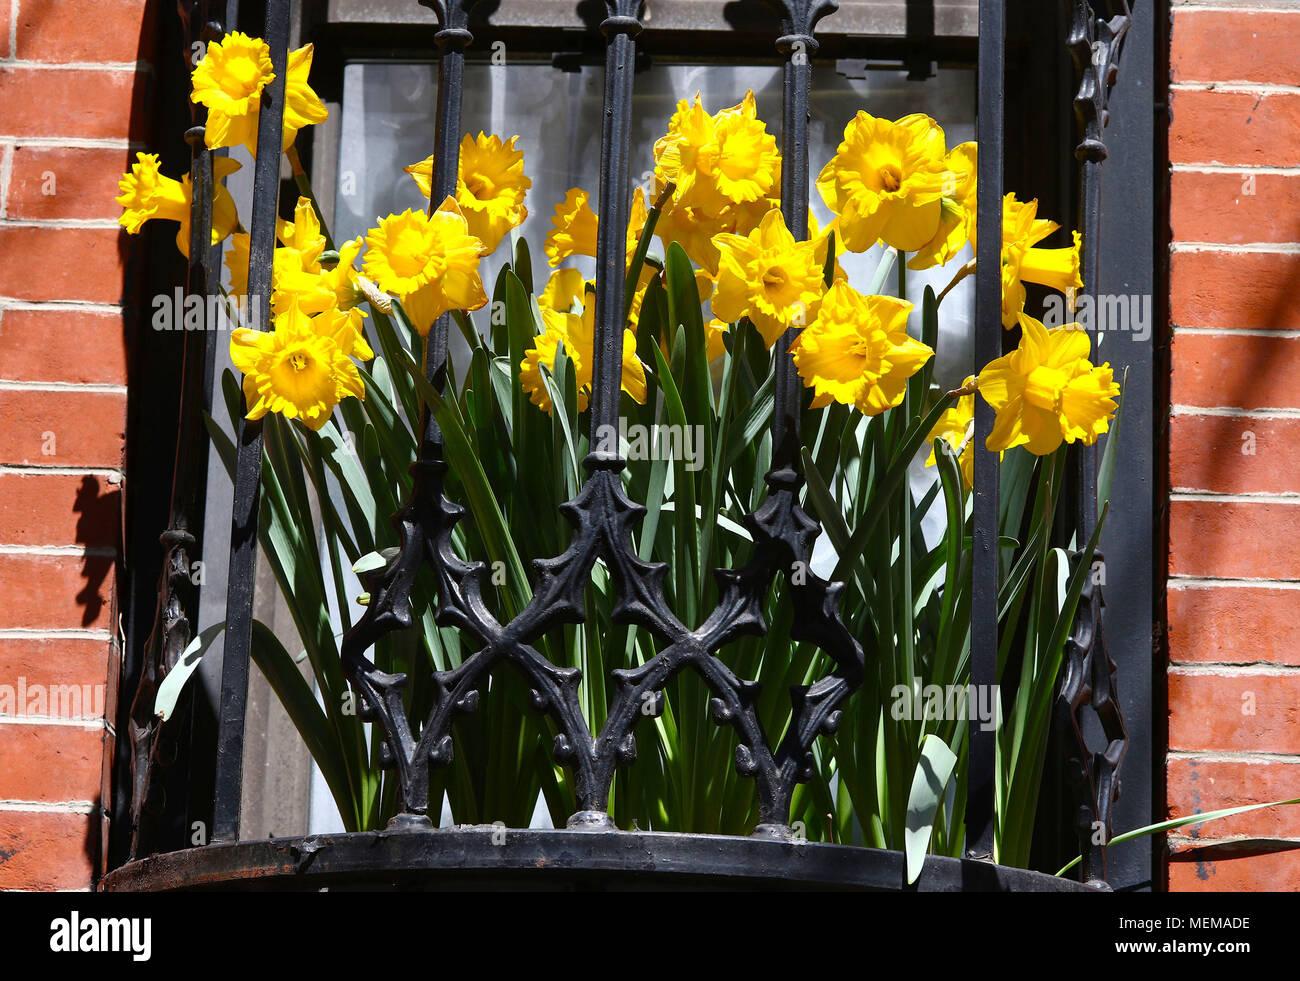 Yellow daffodils in city window box - Stock Image